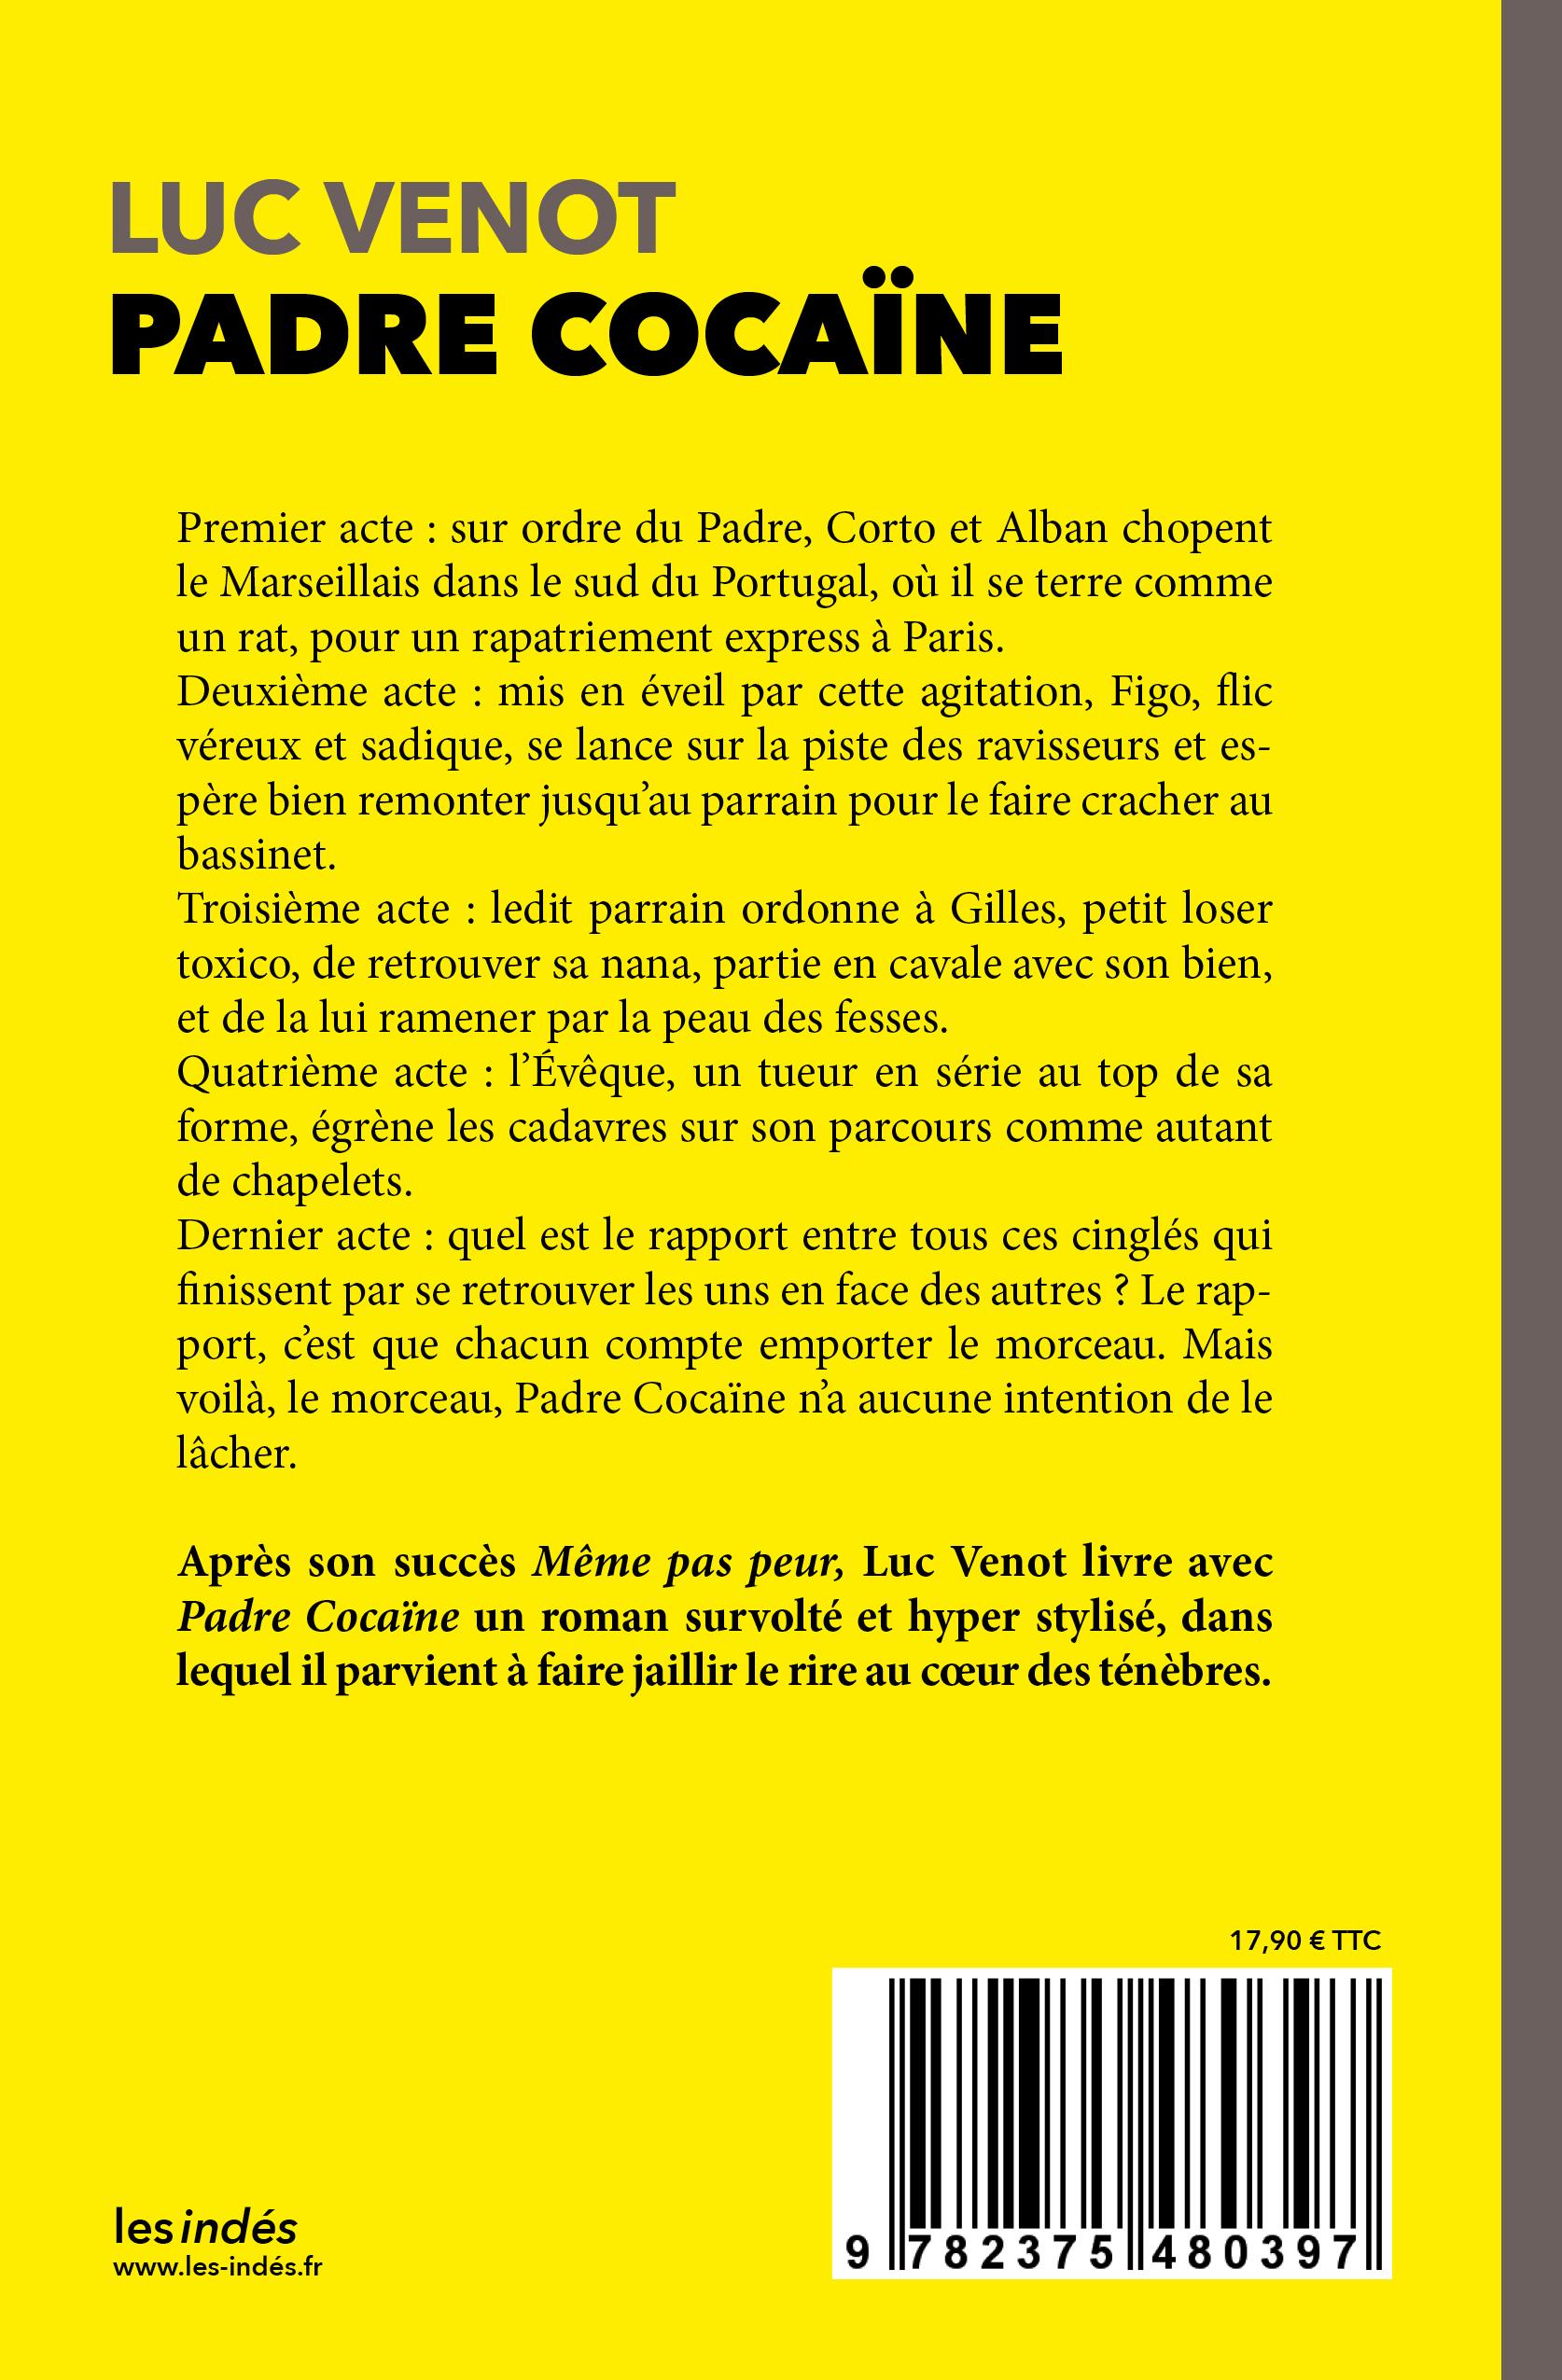 CV4_Padre_Cocaine